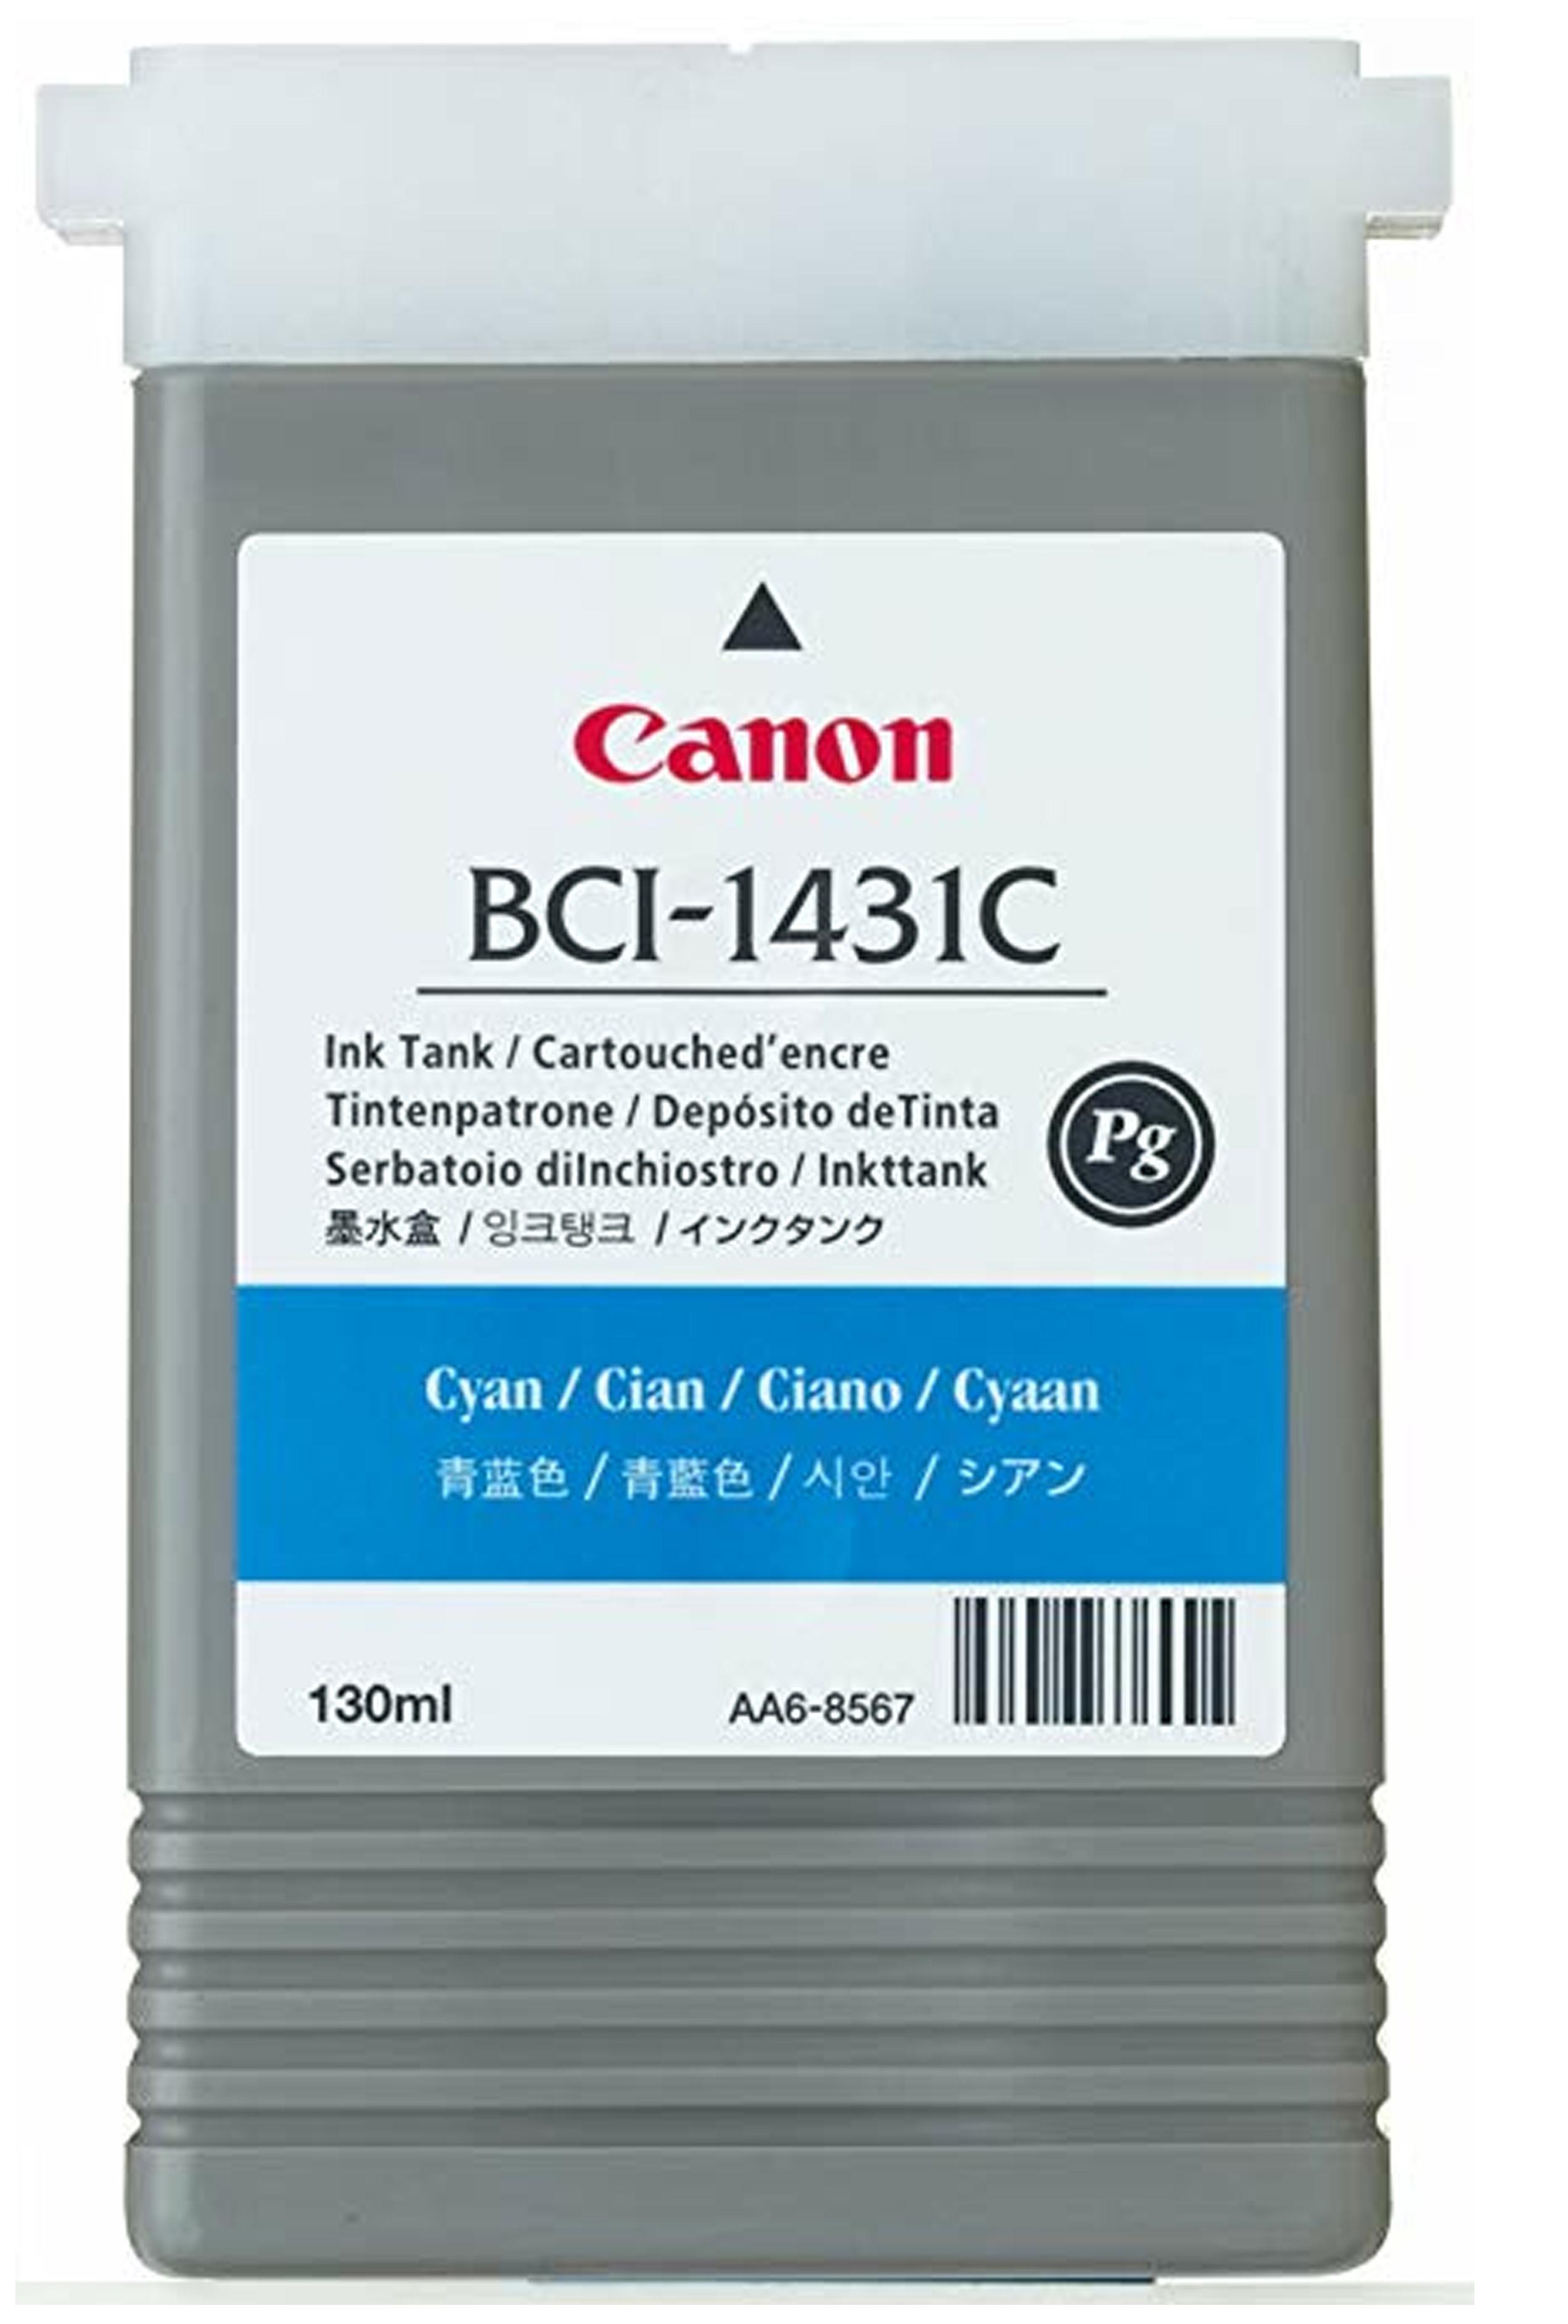 Canon BCI-1431C - Cyan Ink Tank 130ml (8970A001AA)